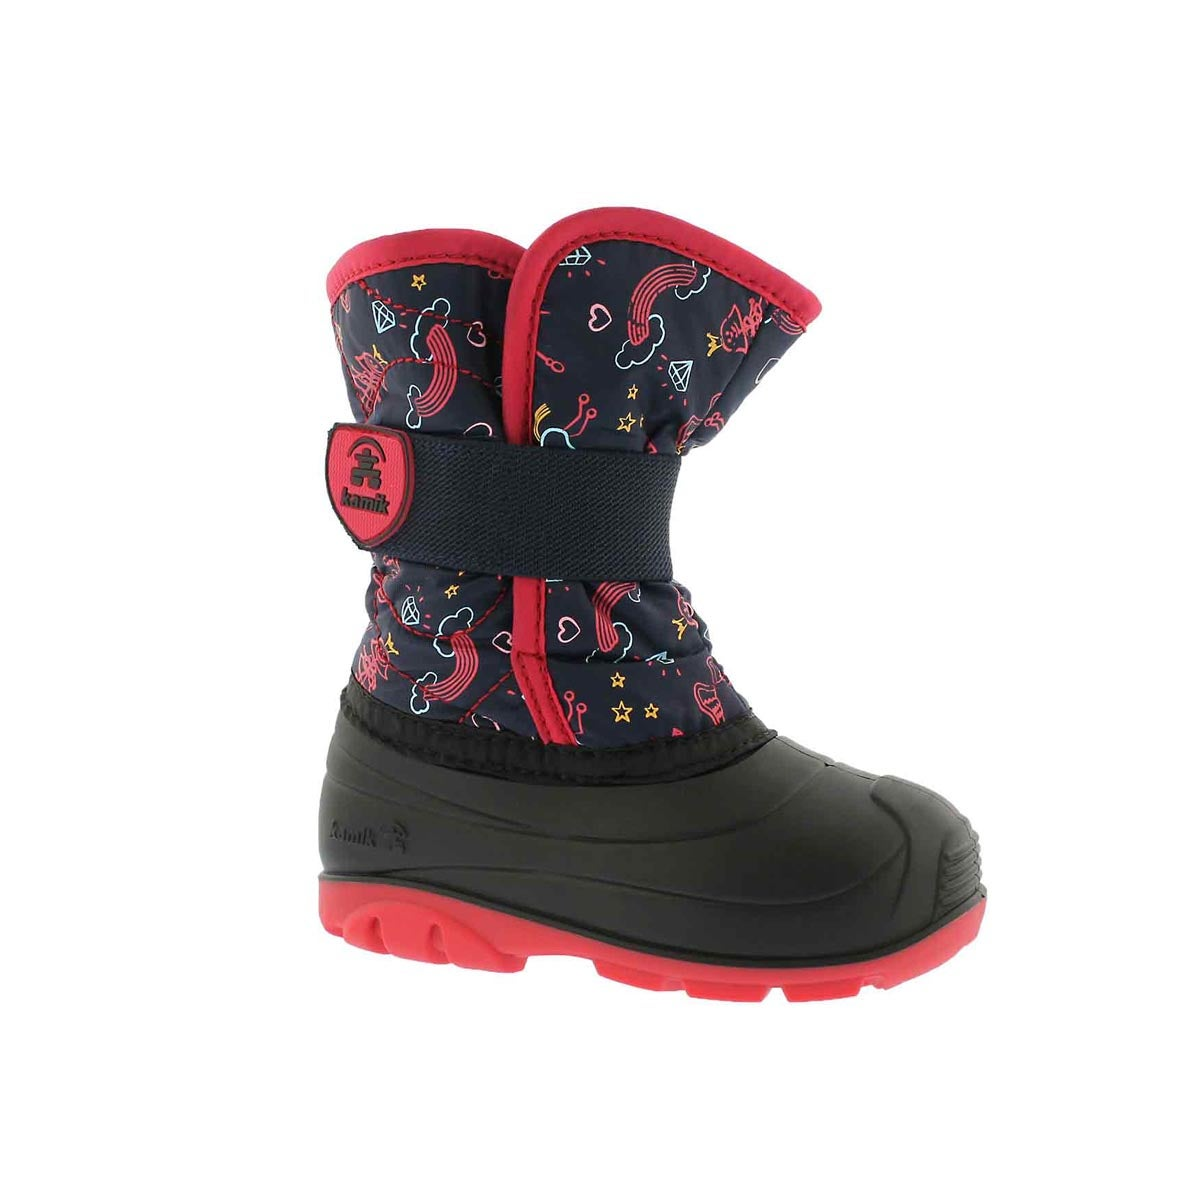 Infants' SNOWBUG 4 nvy/pnk waterproof winter boots